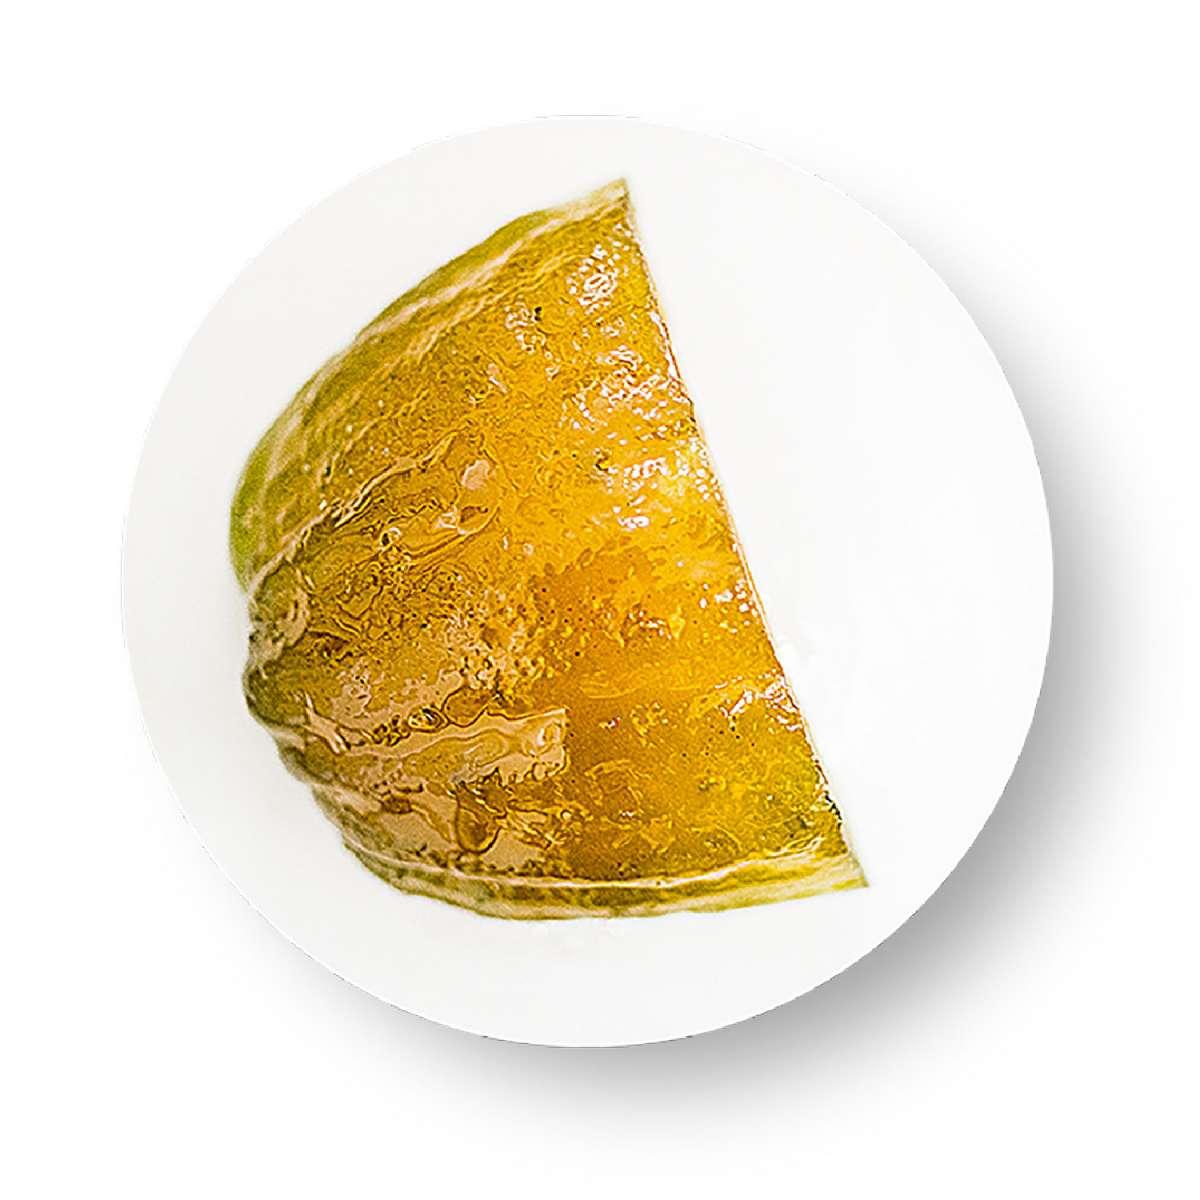 Zitronat-Scheiben - kandiert   Backzeit